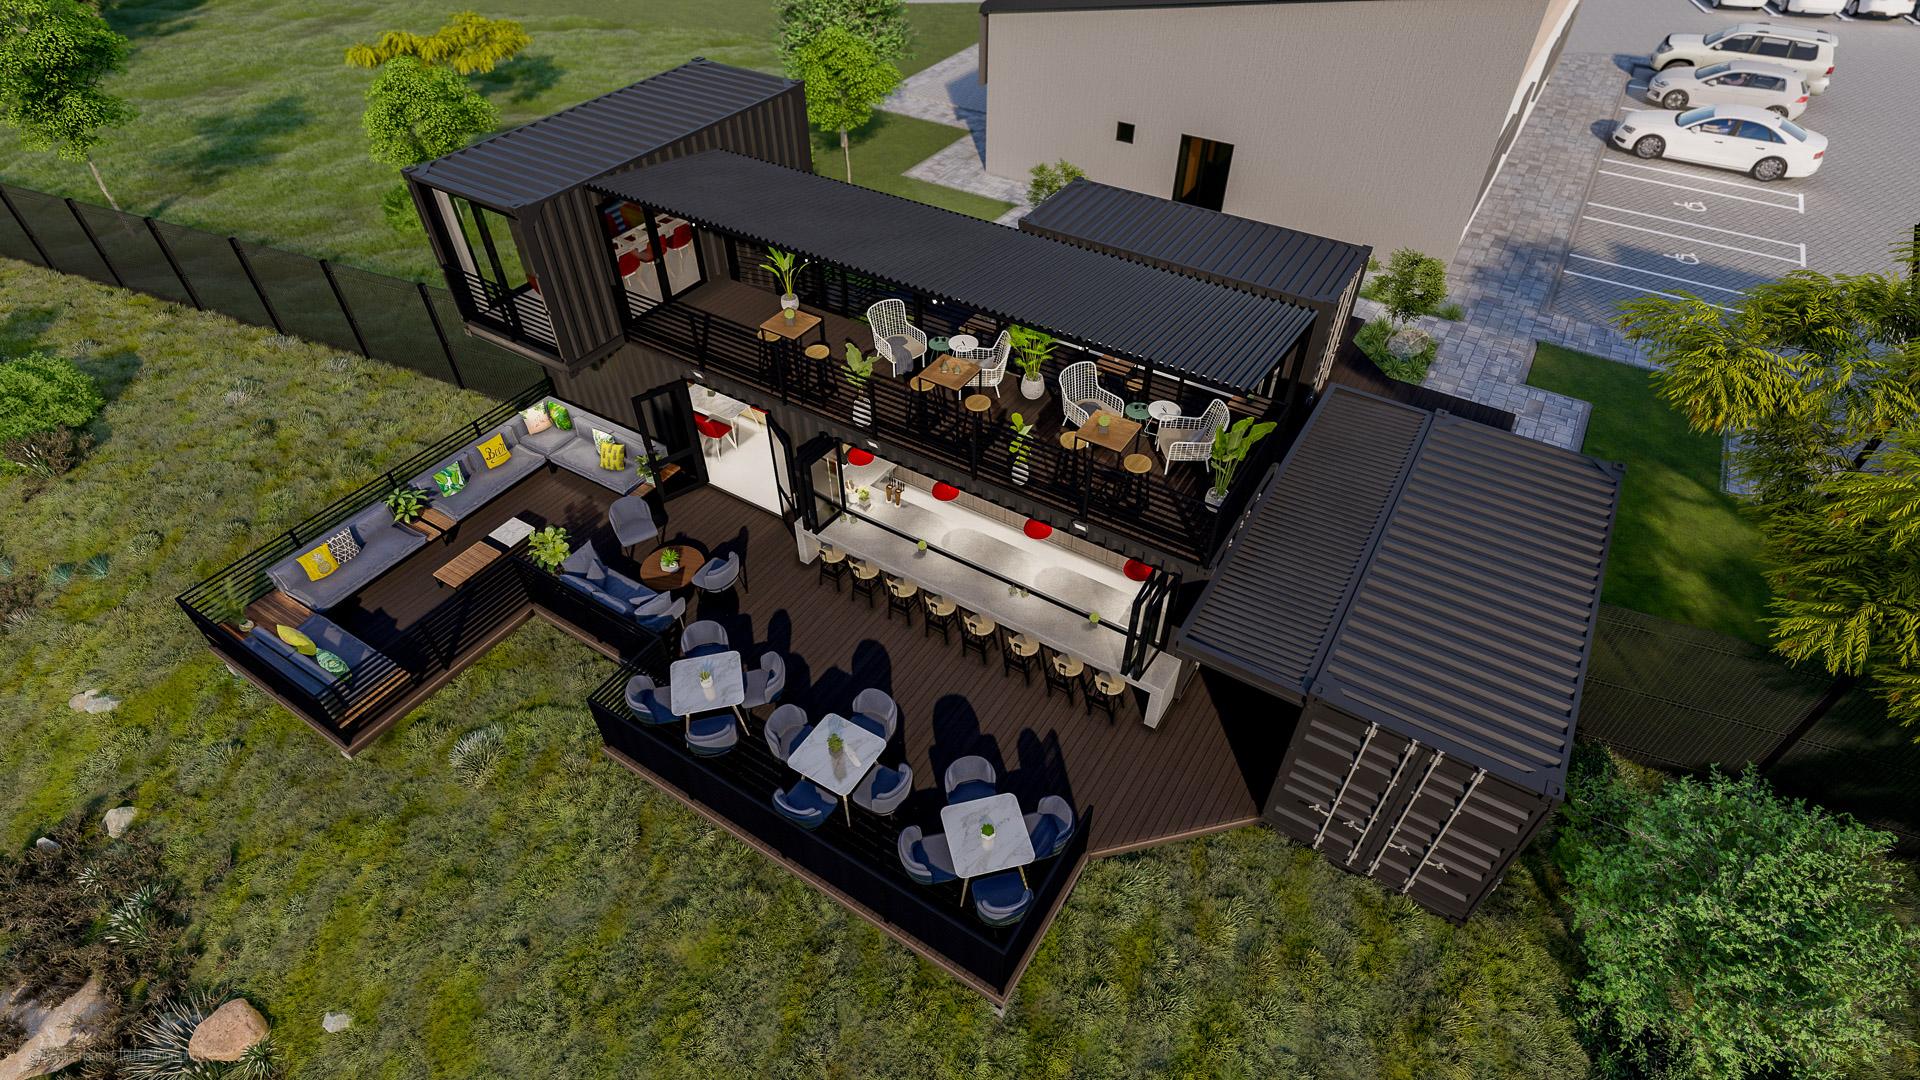 RHPX_Portfolio_LVR Container Restaurant-16